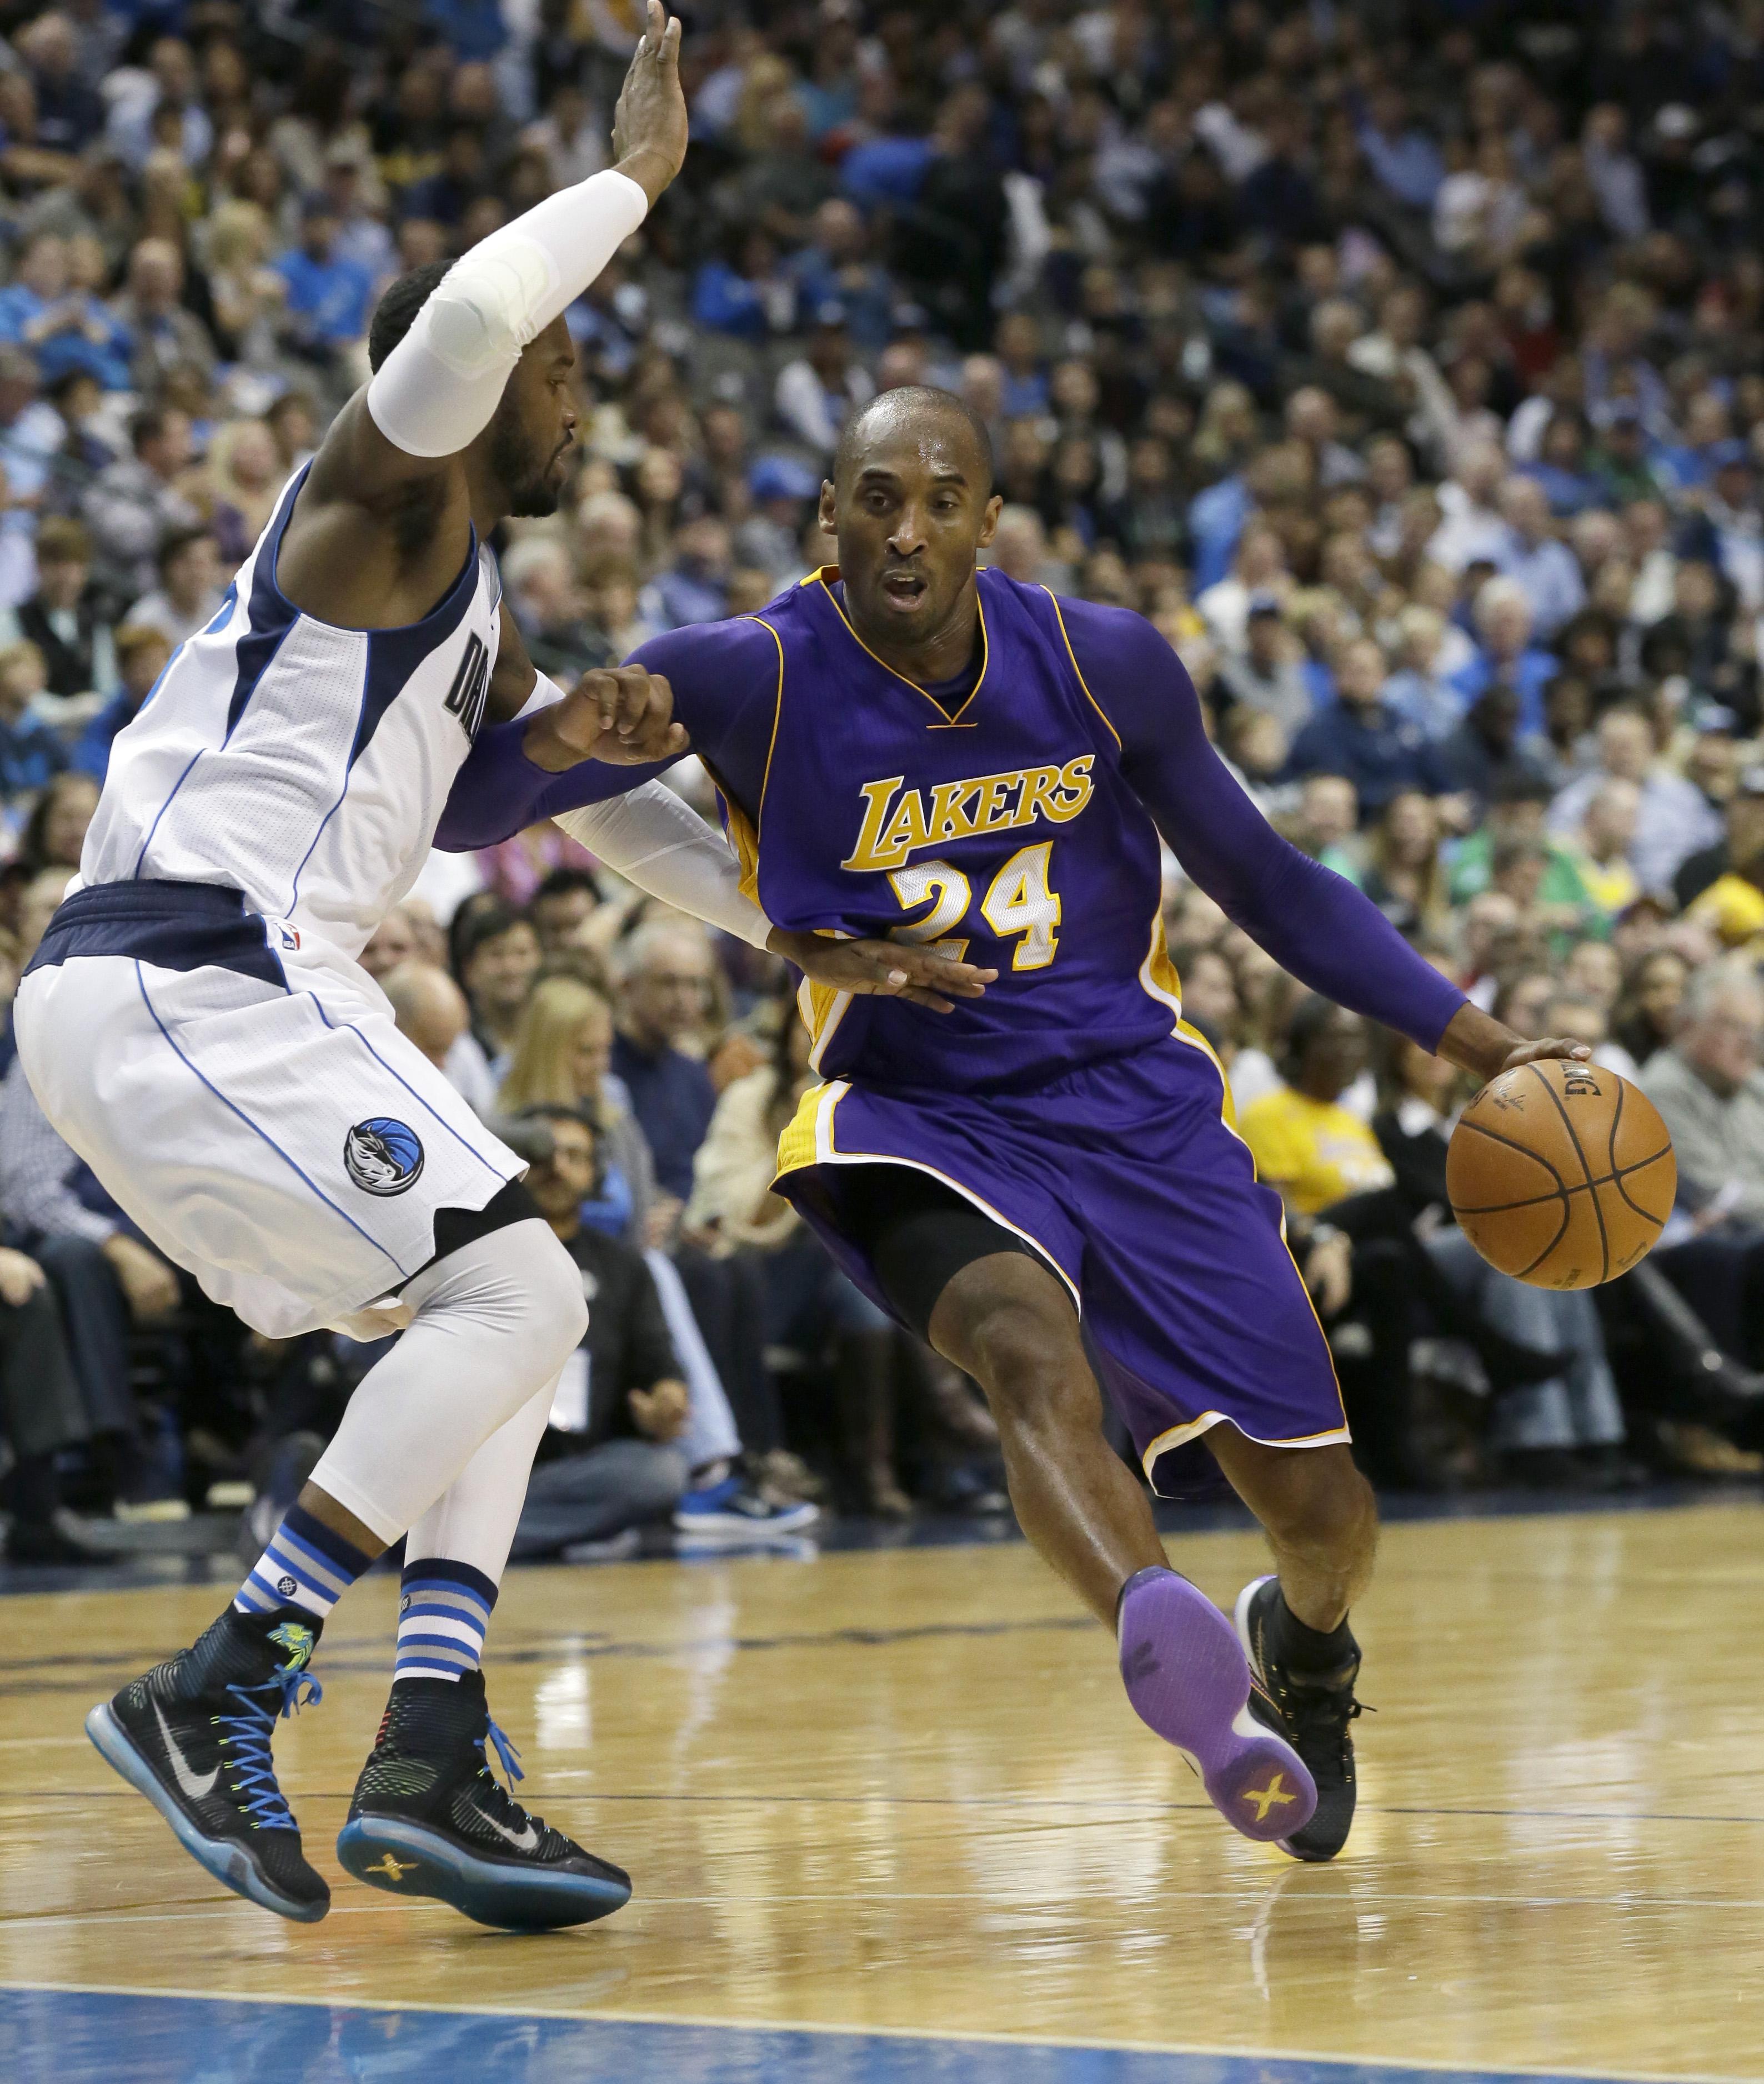 Los Angeles Lakers forward Kobe Bryant (24) drives against Dallas Mavericks guard Raymond Felton (2) during the first half of an NBA basketball game Friday, Nov. 13, 2015, in Dallas. (AP Photo/LM Otero)